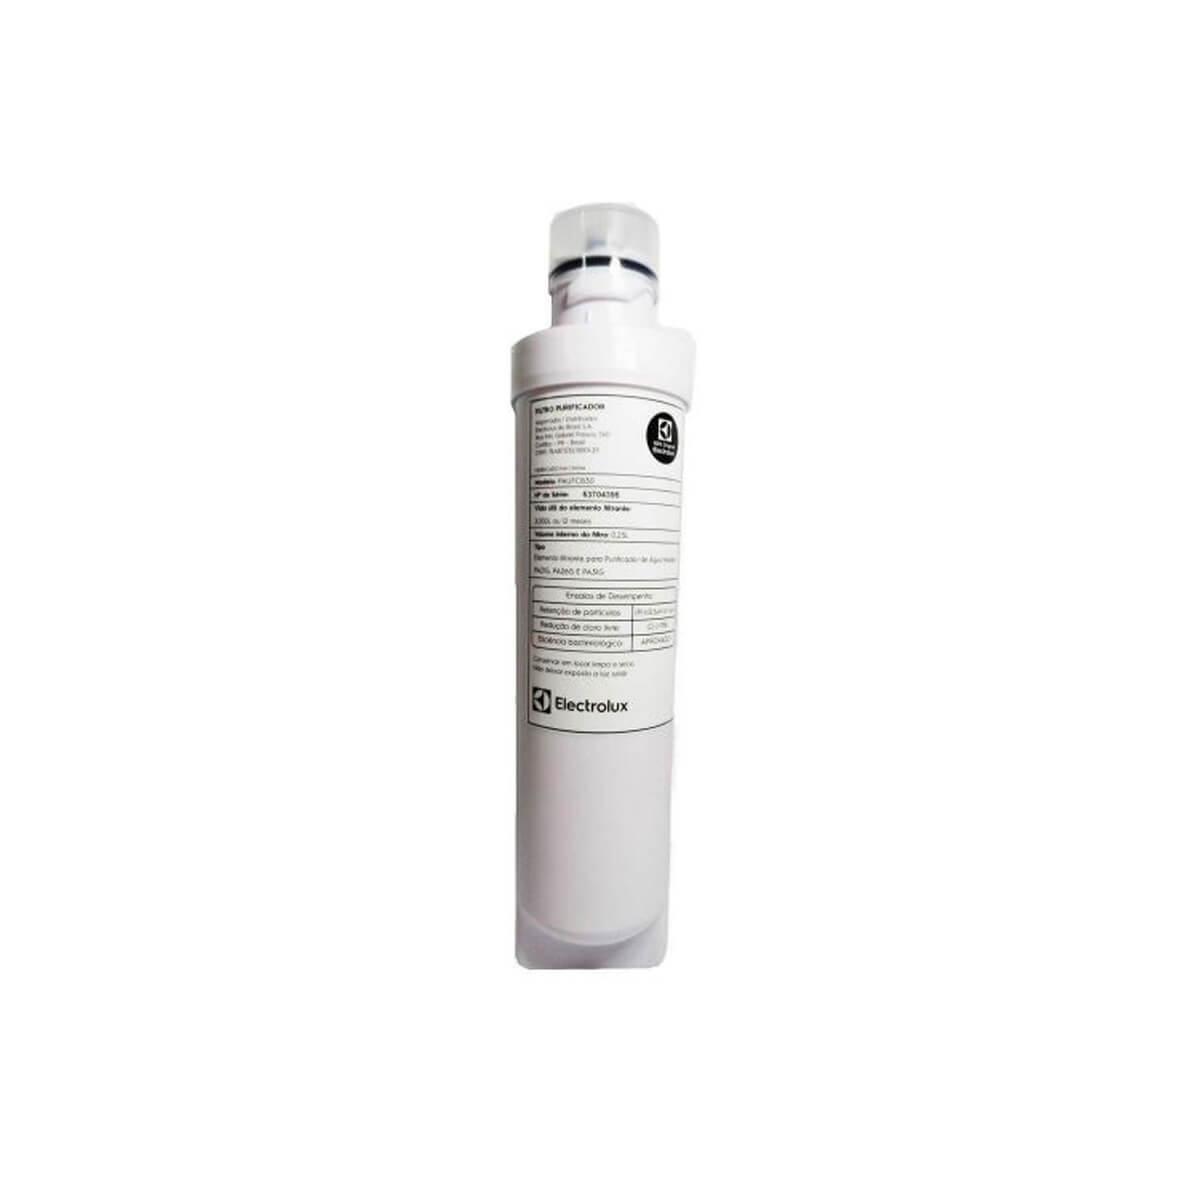 Filtro Para Purificador De Água Electrolux PA21G PA26G PA31G -  306100000121